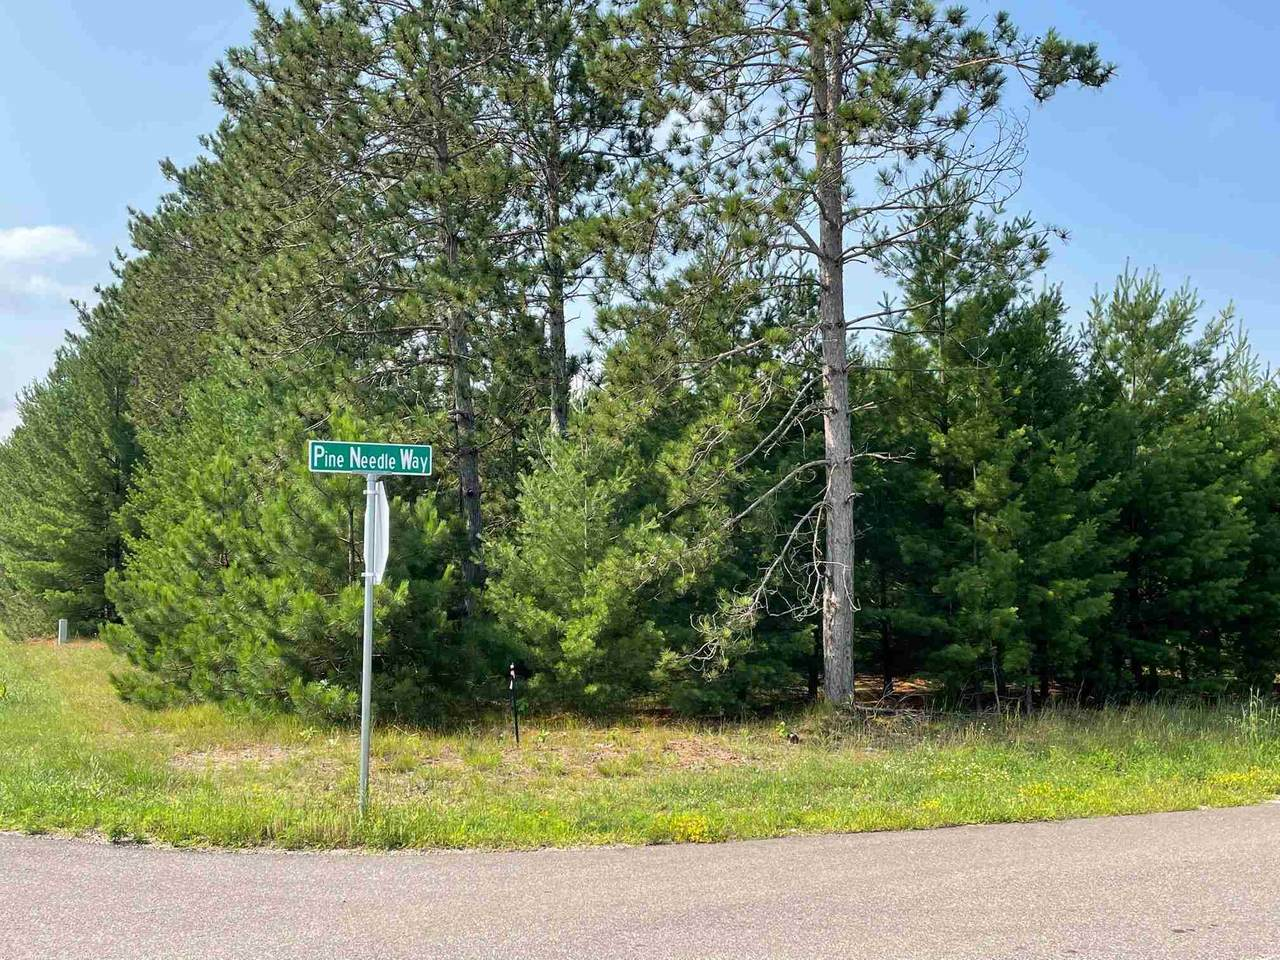 4720-Lot 22 of Grand Pine Needle Way - Photo 1